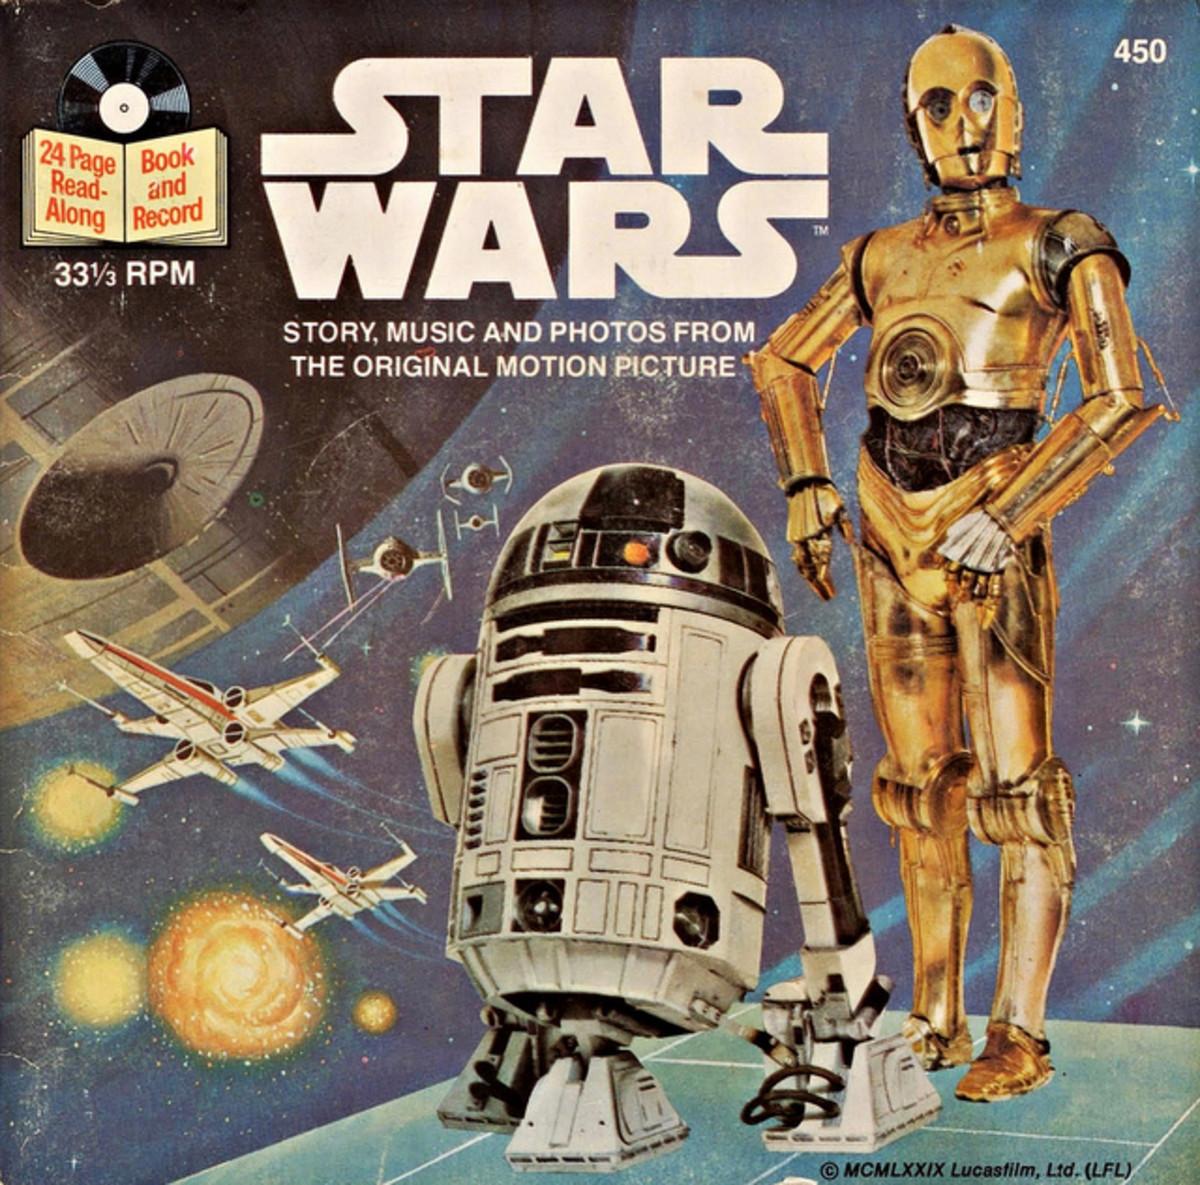 "Star Wars Buena Vista Records 450 7"" Vinyl Record, US Pressing (1979) 33 1/3 rpm w/ 24 Page Read Along Book"